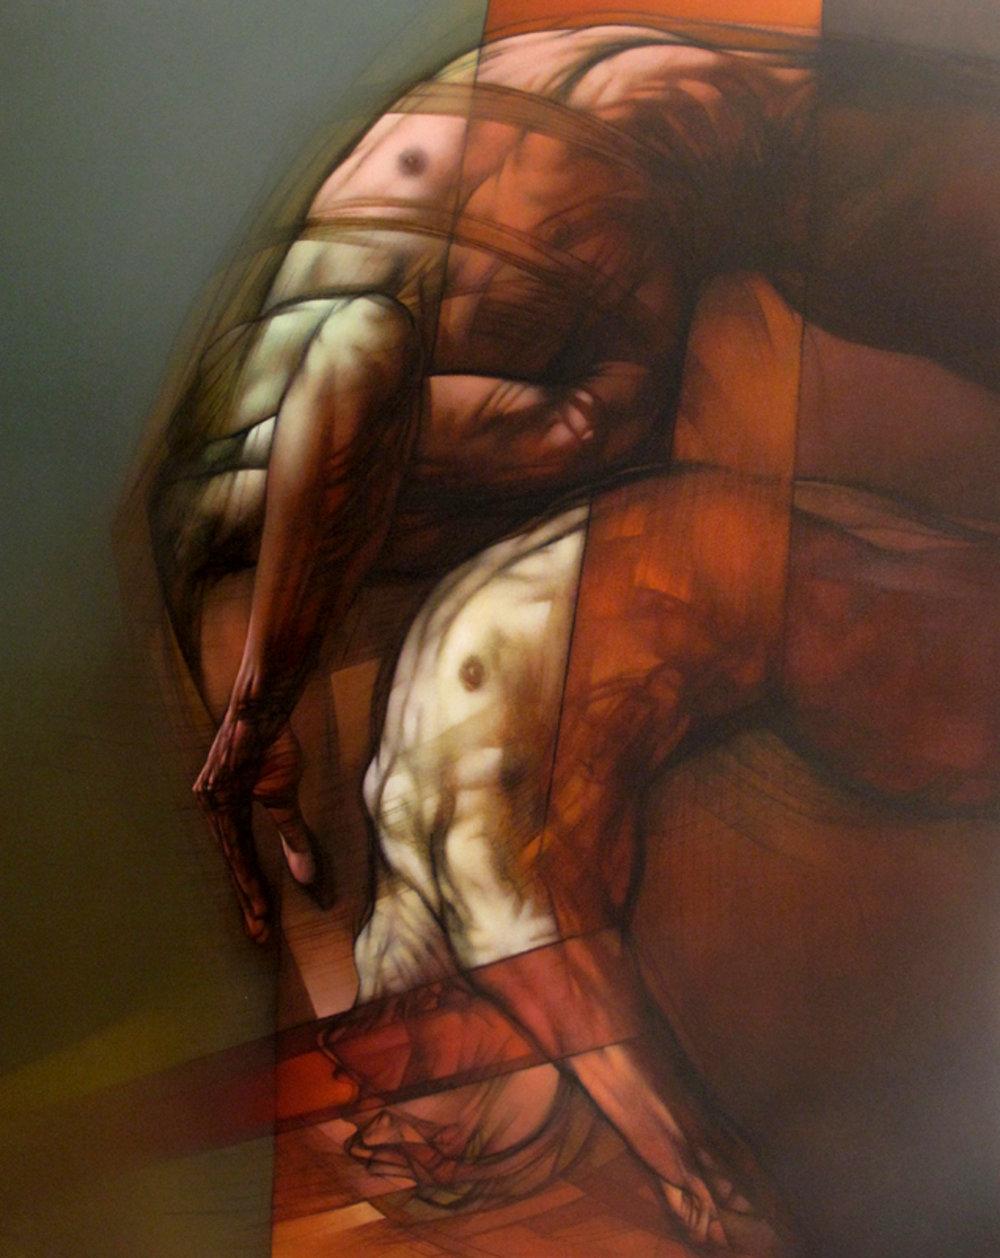 Silent Witnesses Artwork by Jorge Posada